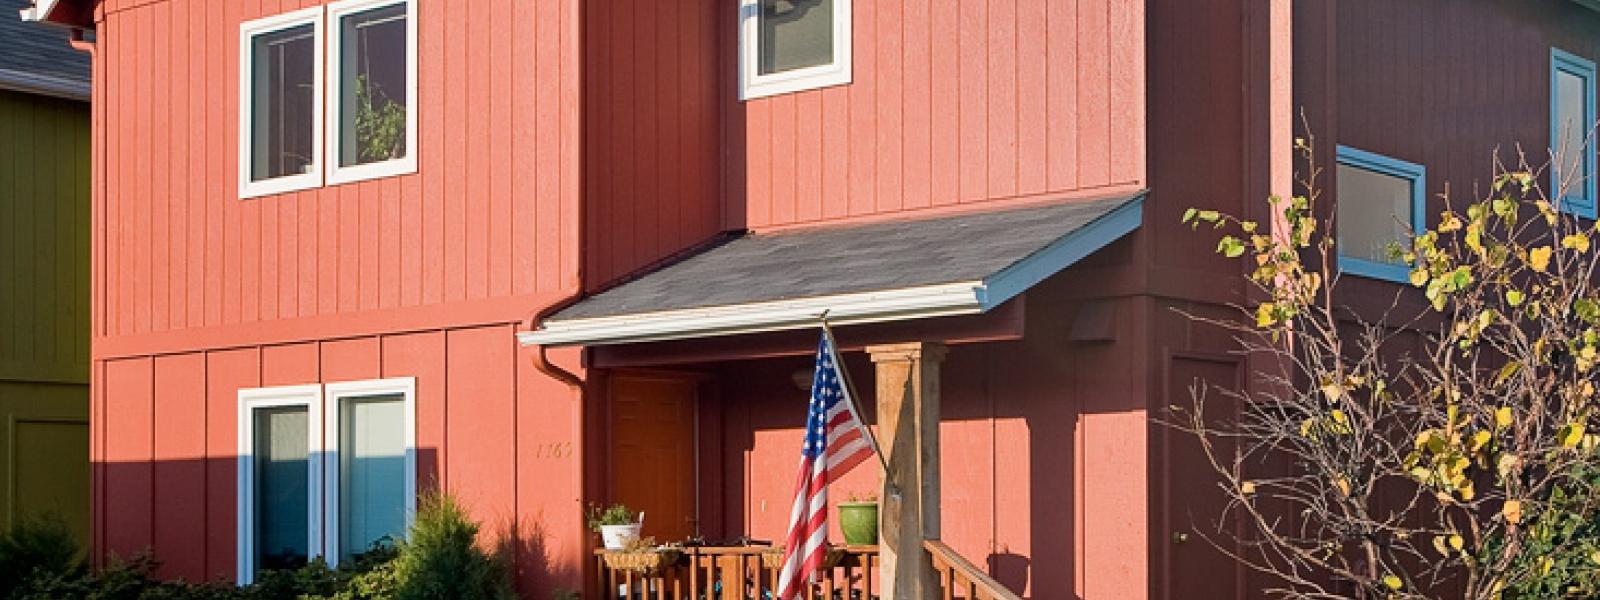 7788 Strawberry Village Cottage, Alaska, 99502, 2 Bedrooms Bedrooms, ,1.5 BathroomsBathrooms,Single Family,For Rent,Strawberry Village Cottage,1031